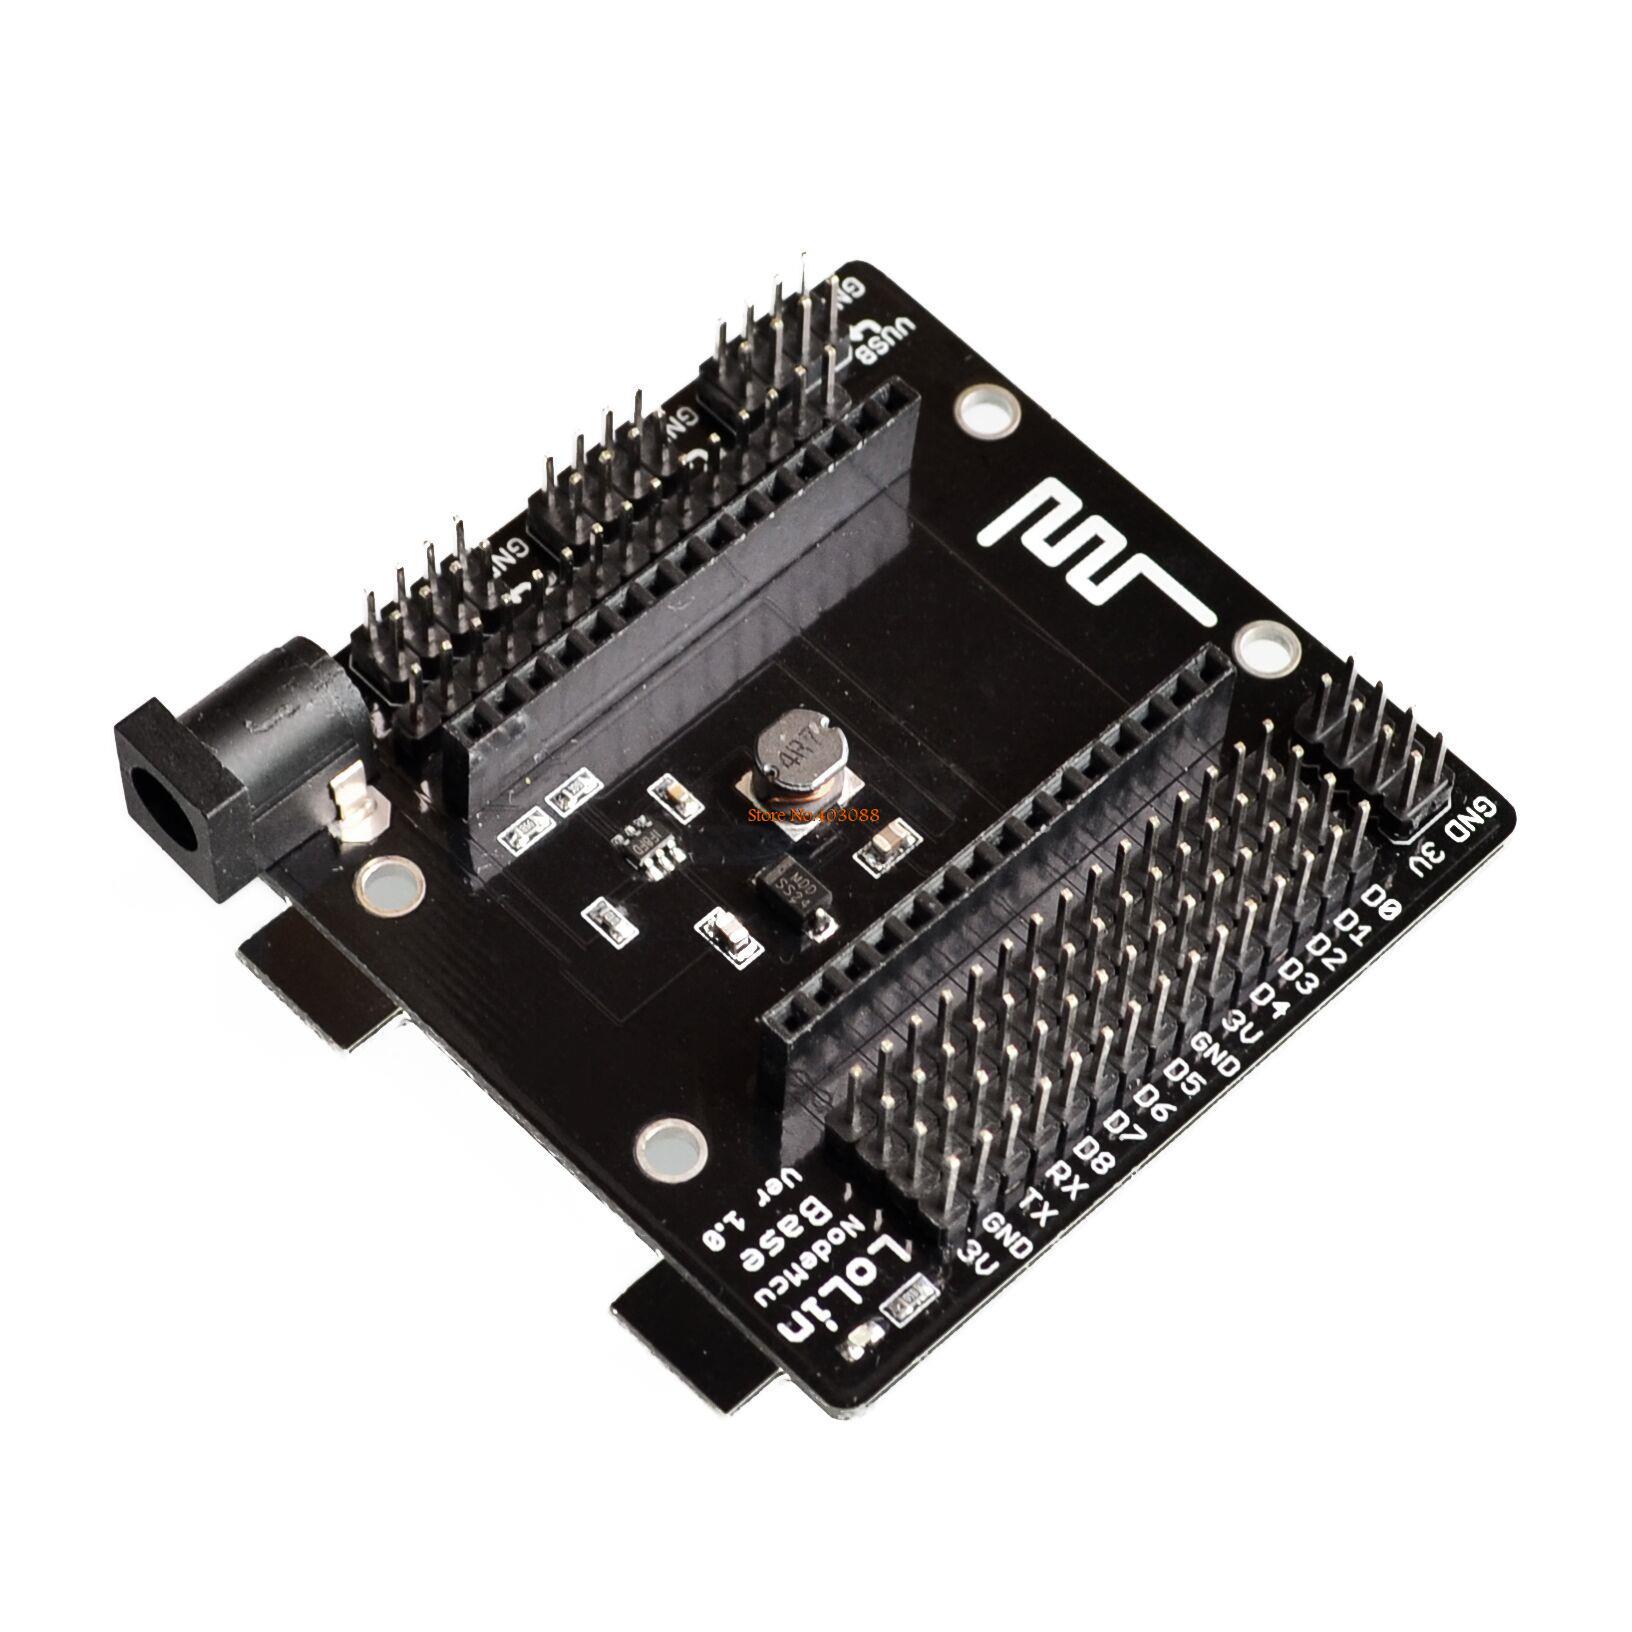 10 pçs/lote nodemcu nó mcu base esp8266 teste diy breadboard basics tester adequado para nodemcu v3